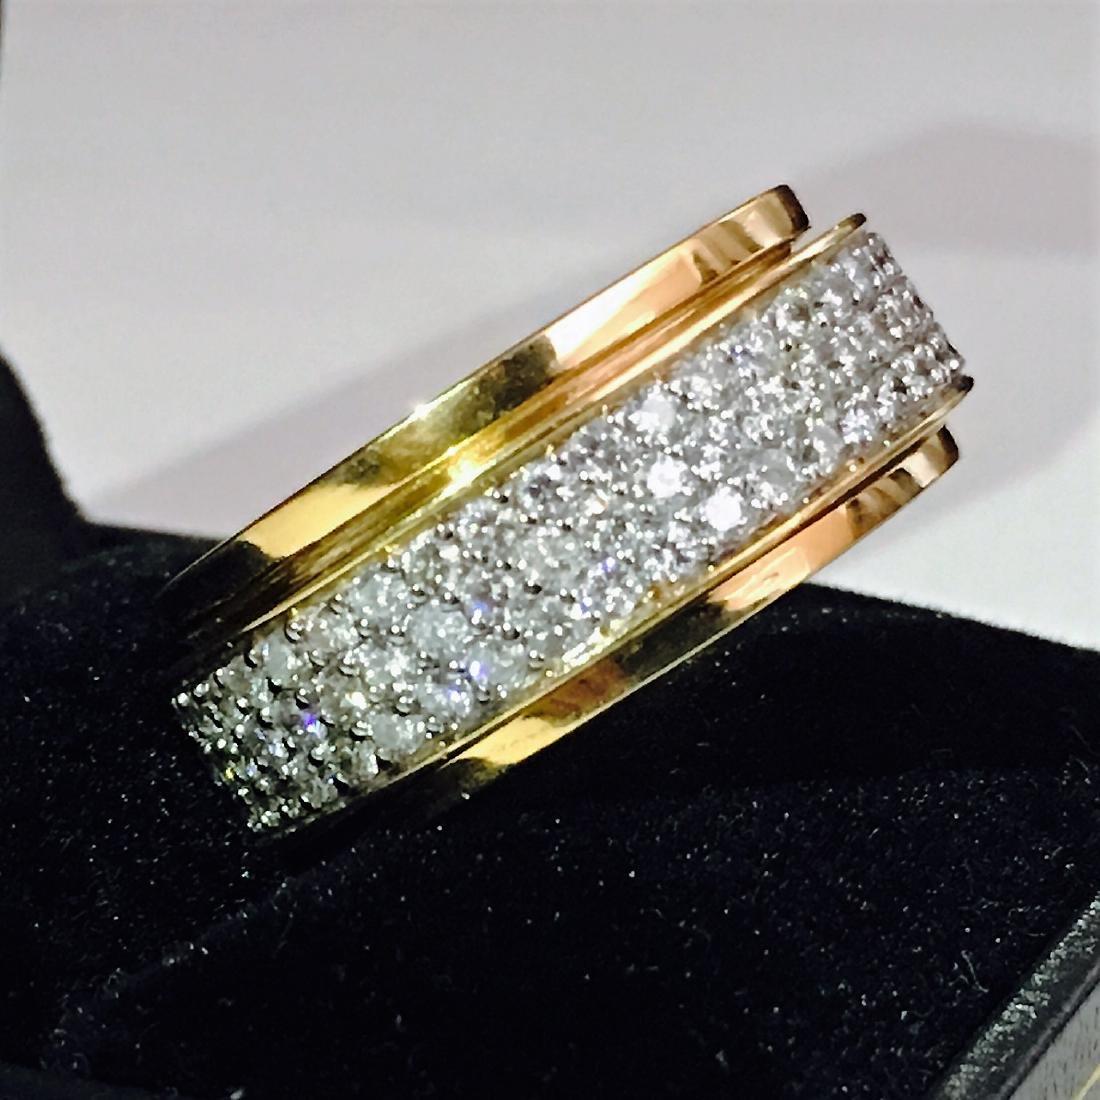 18k Yellow Gold, 4.50 Carat VVS Diamond Ring - 4